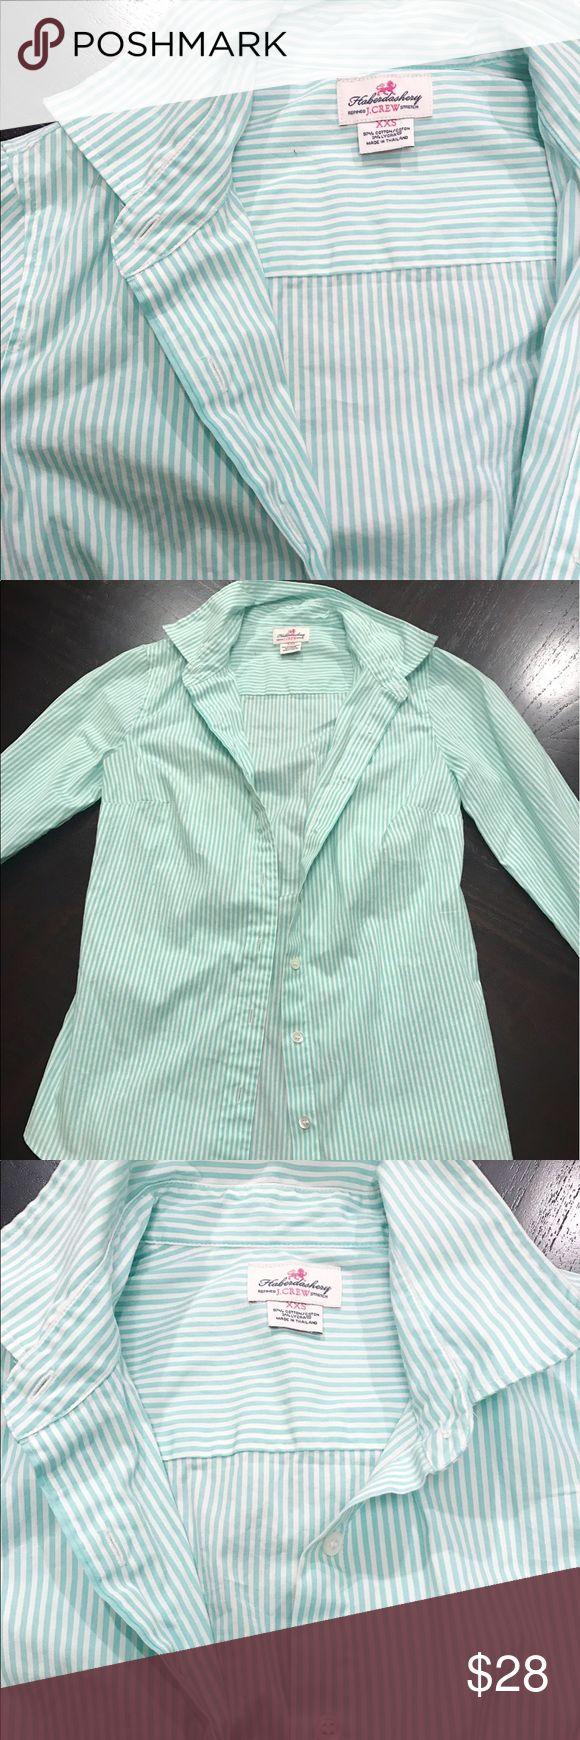 Selling this J.Crew Seersucker Shirt on Poshmark! My username is: optionc. #shopmycloset #poshmark #fashion #shopping #style #forsale #J. Crew #Tops